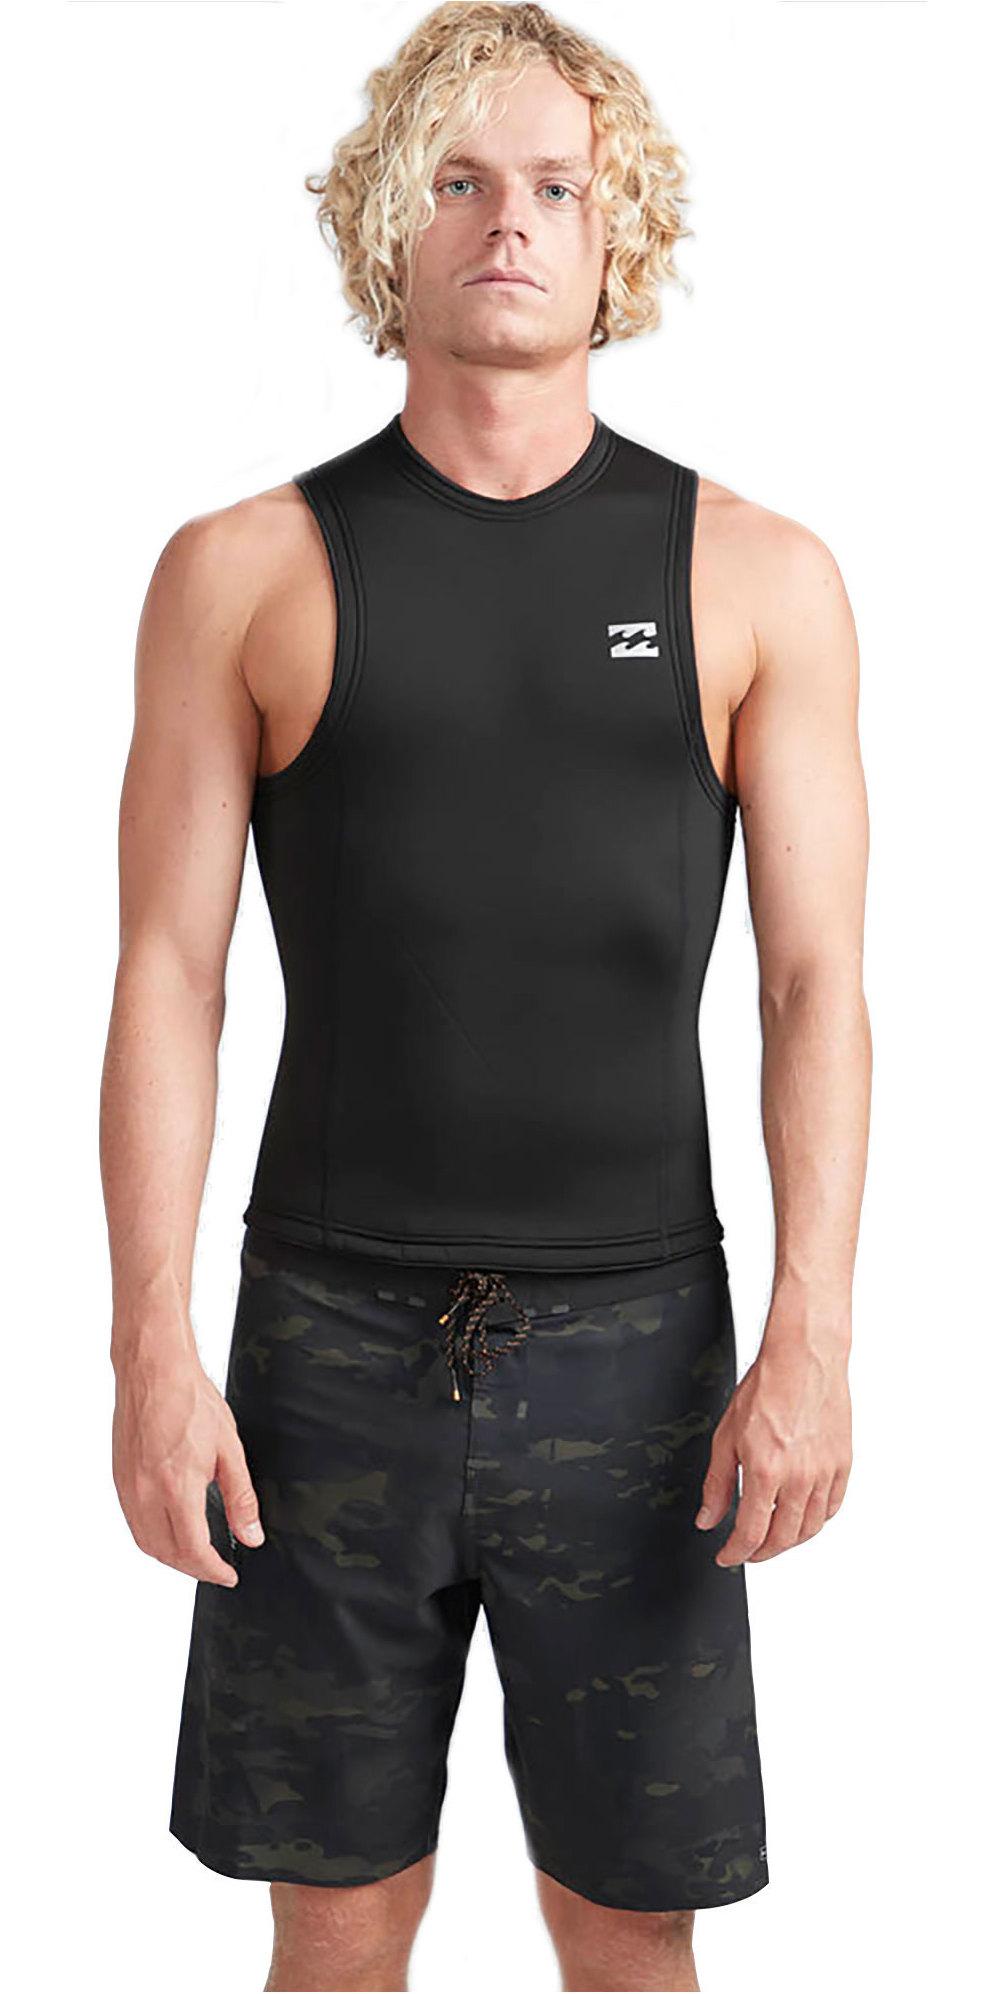 2019 Billabong Mens 2mm Furnace Absolute Neo Vest Black N42M27